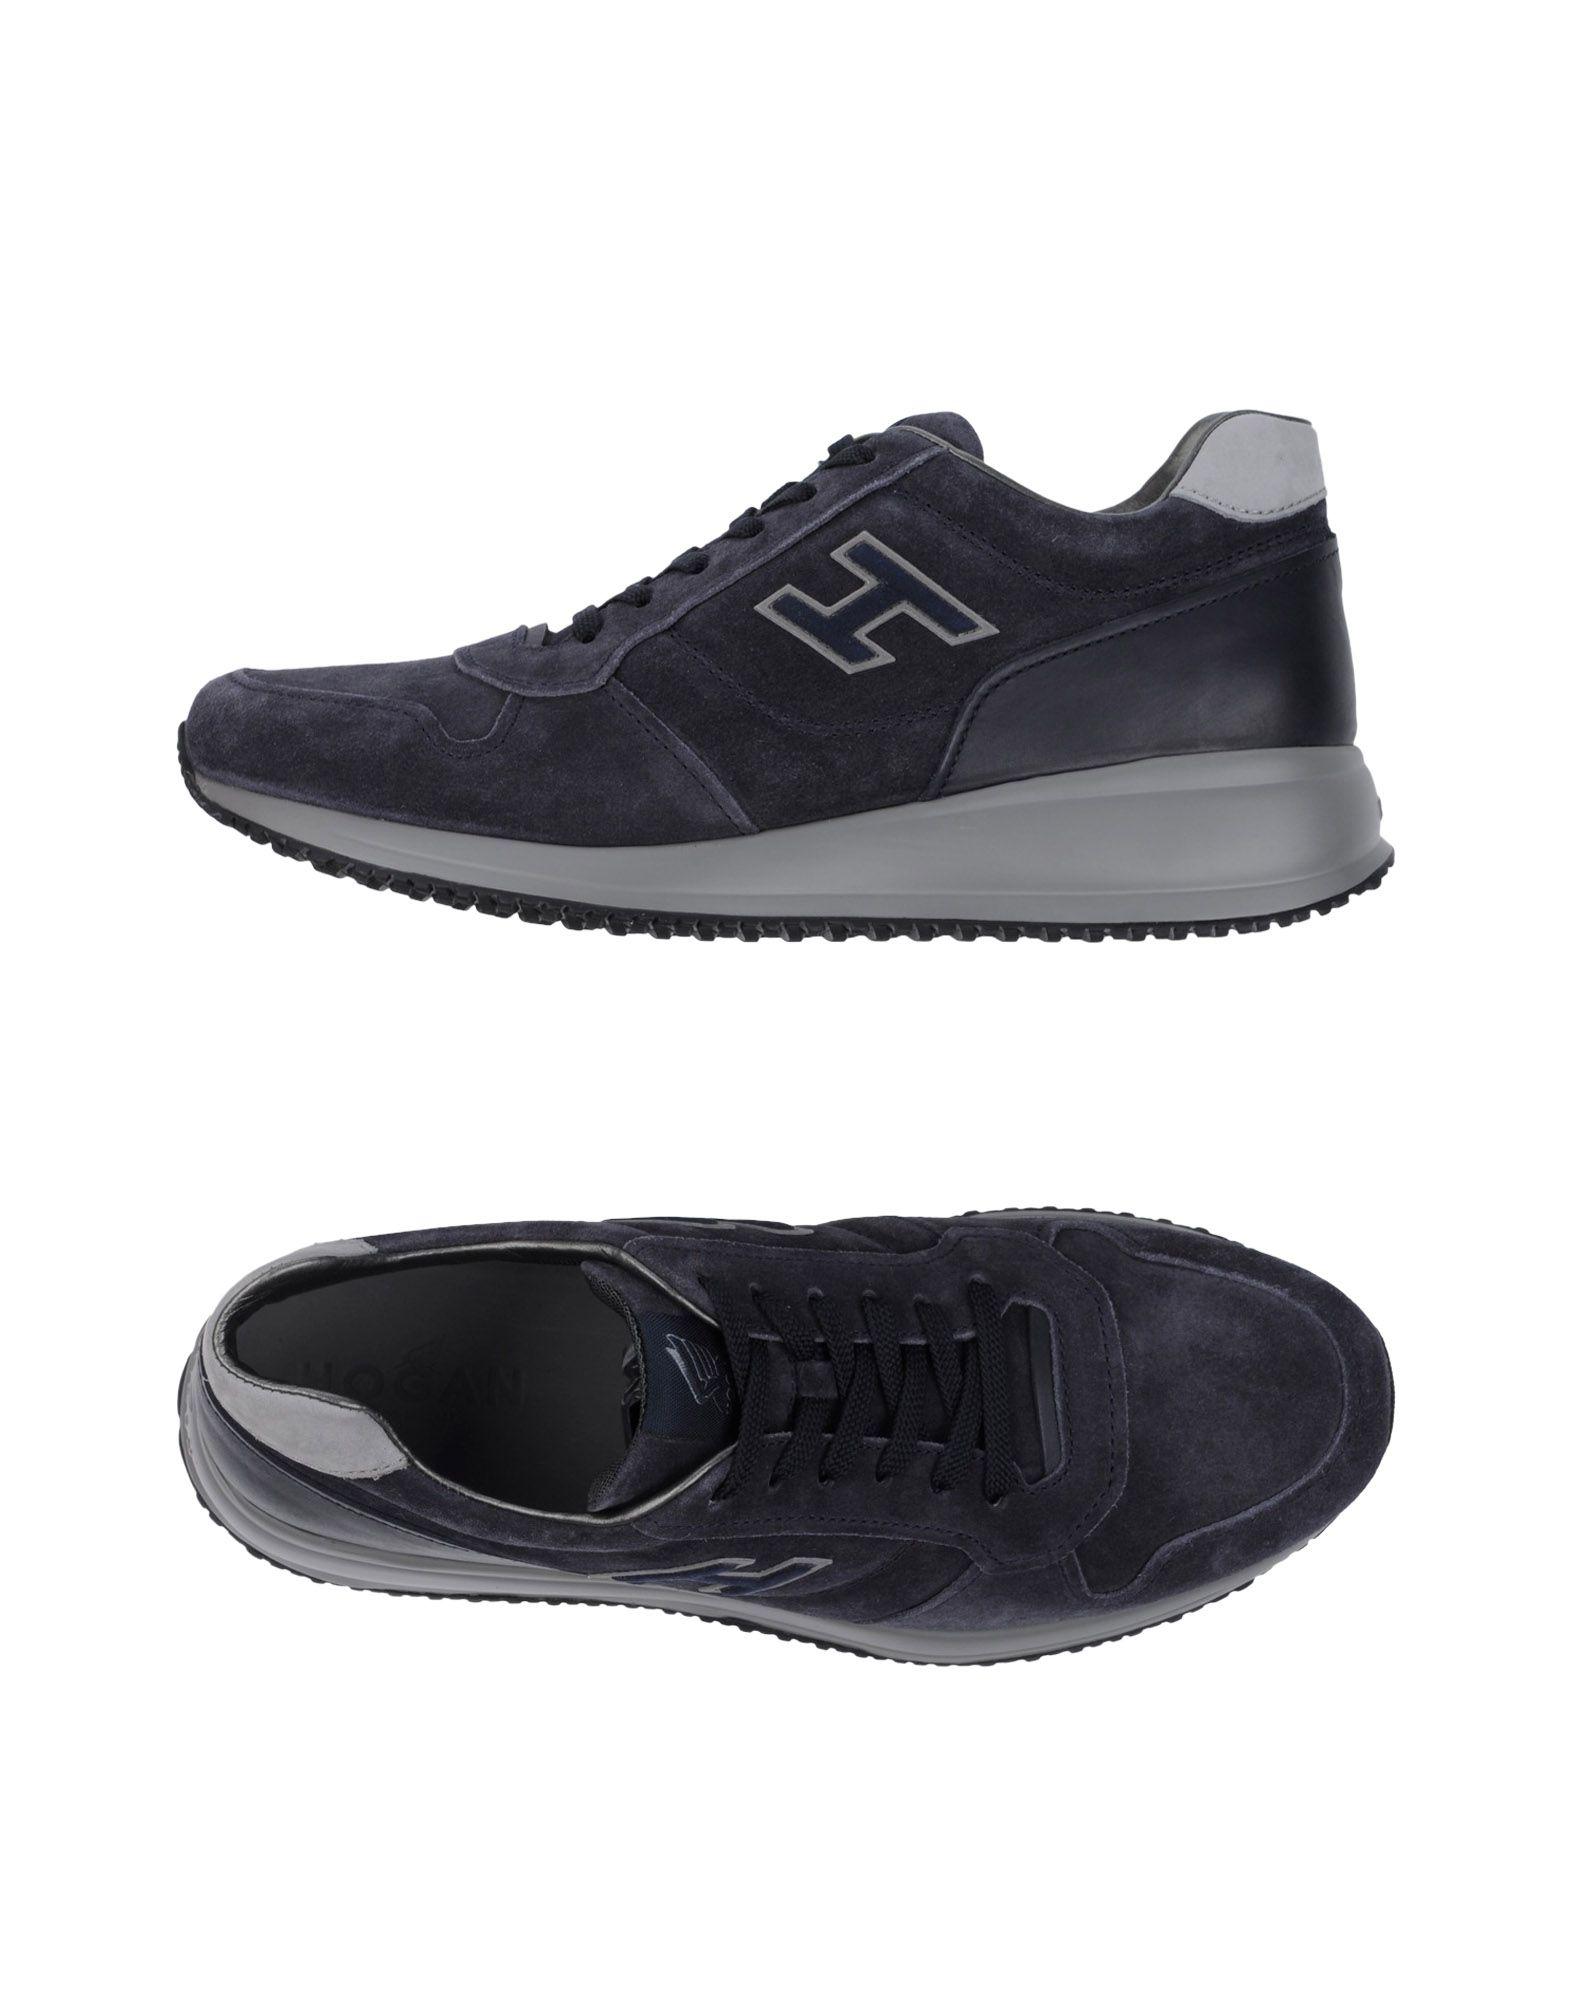 Hogan Sneakers Herren  11299150AD Gute Qualität beliebte Schuhe